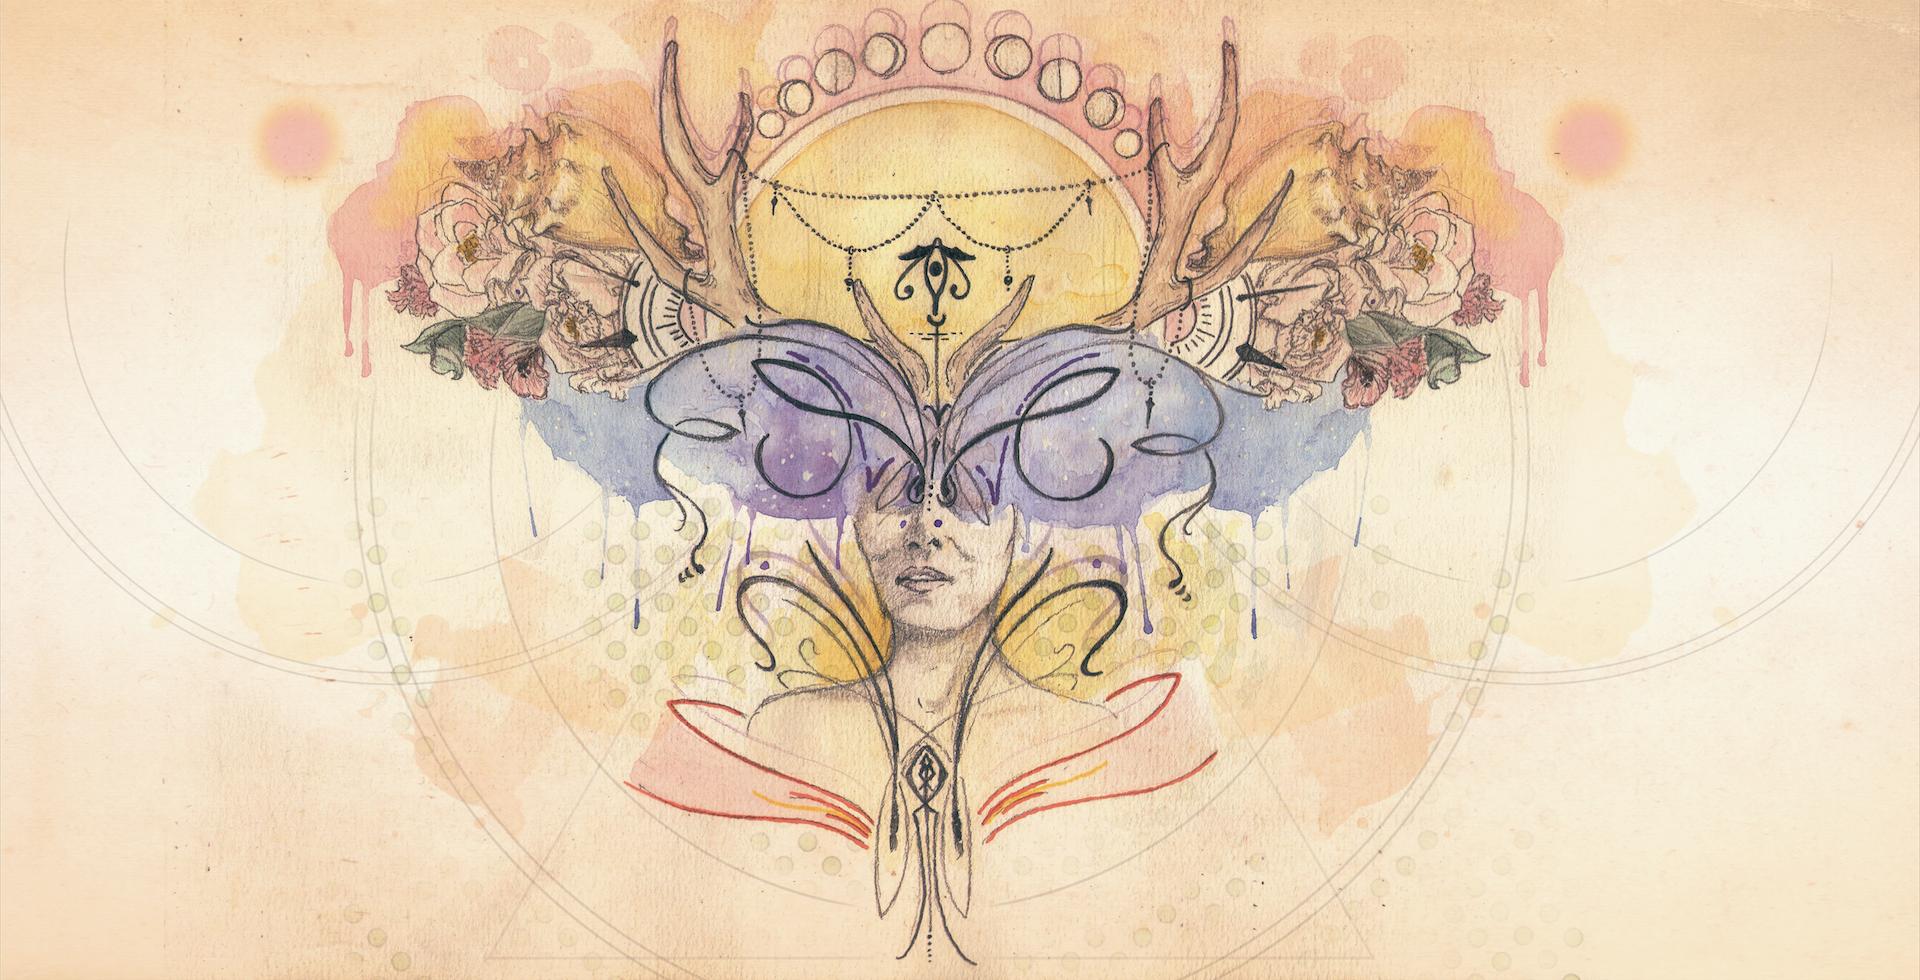 Encarte Pilgrimage - Din Rose álbum